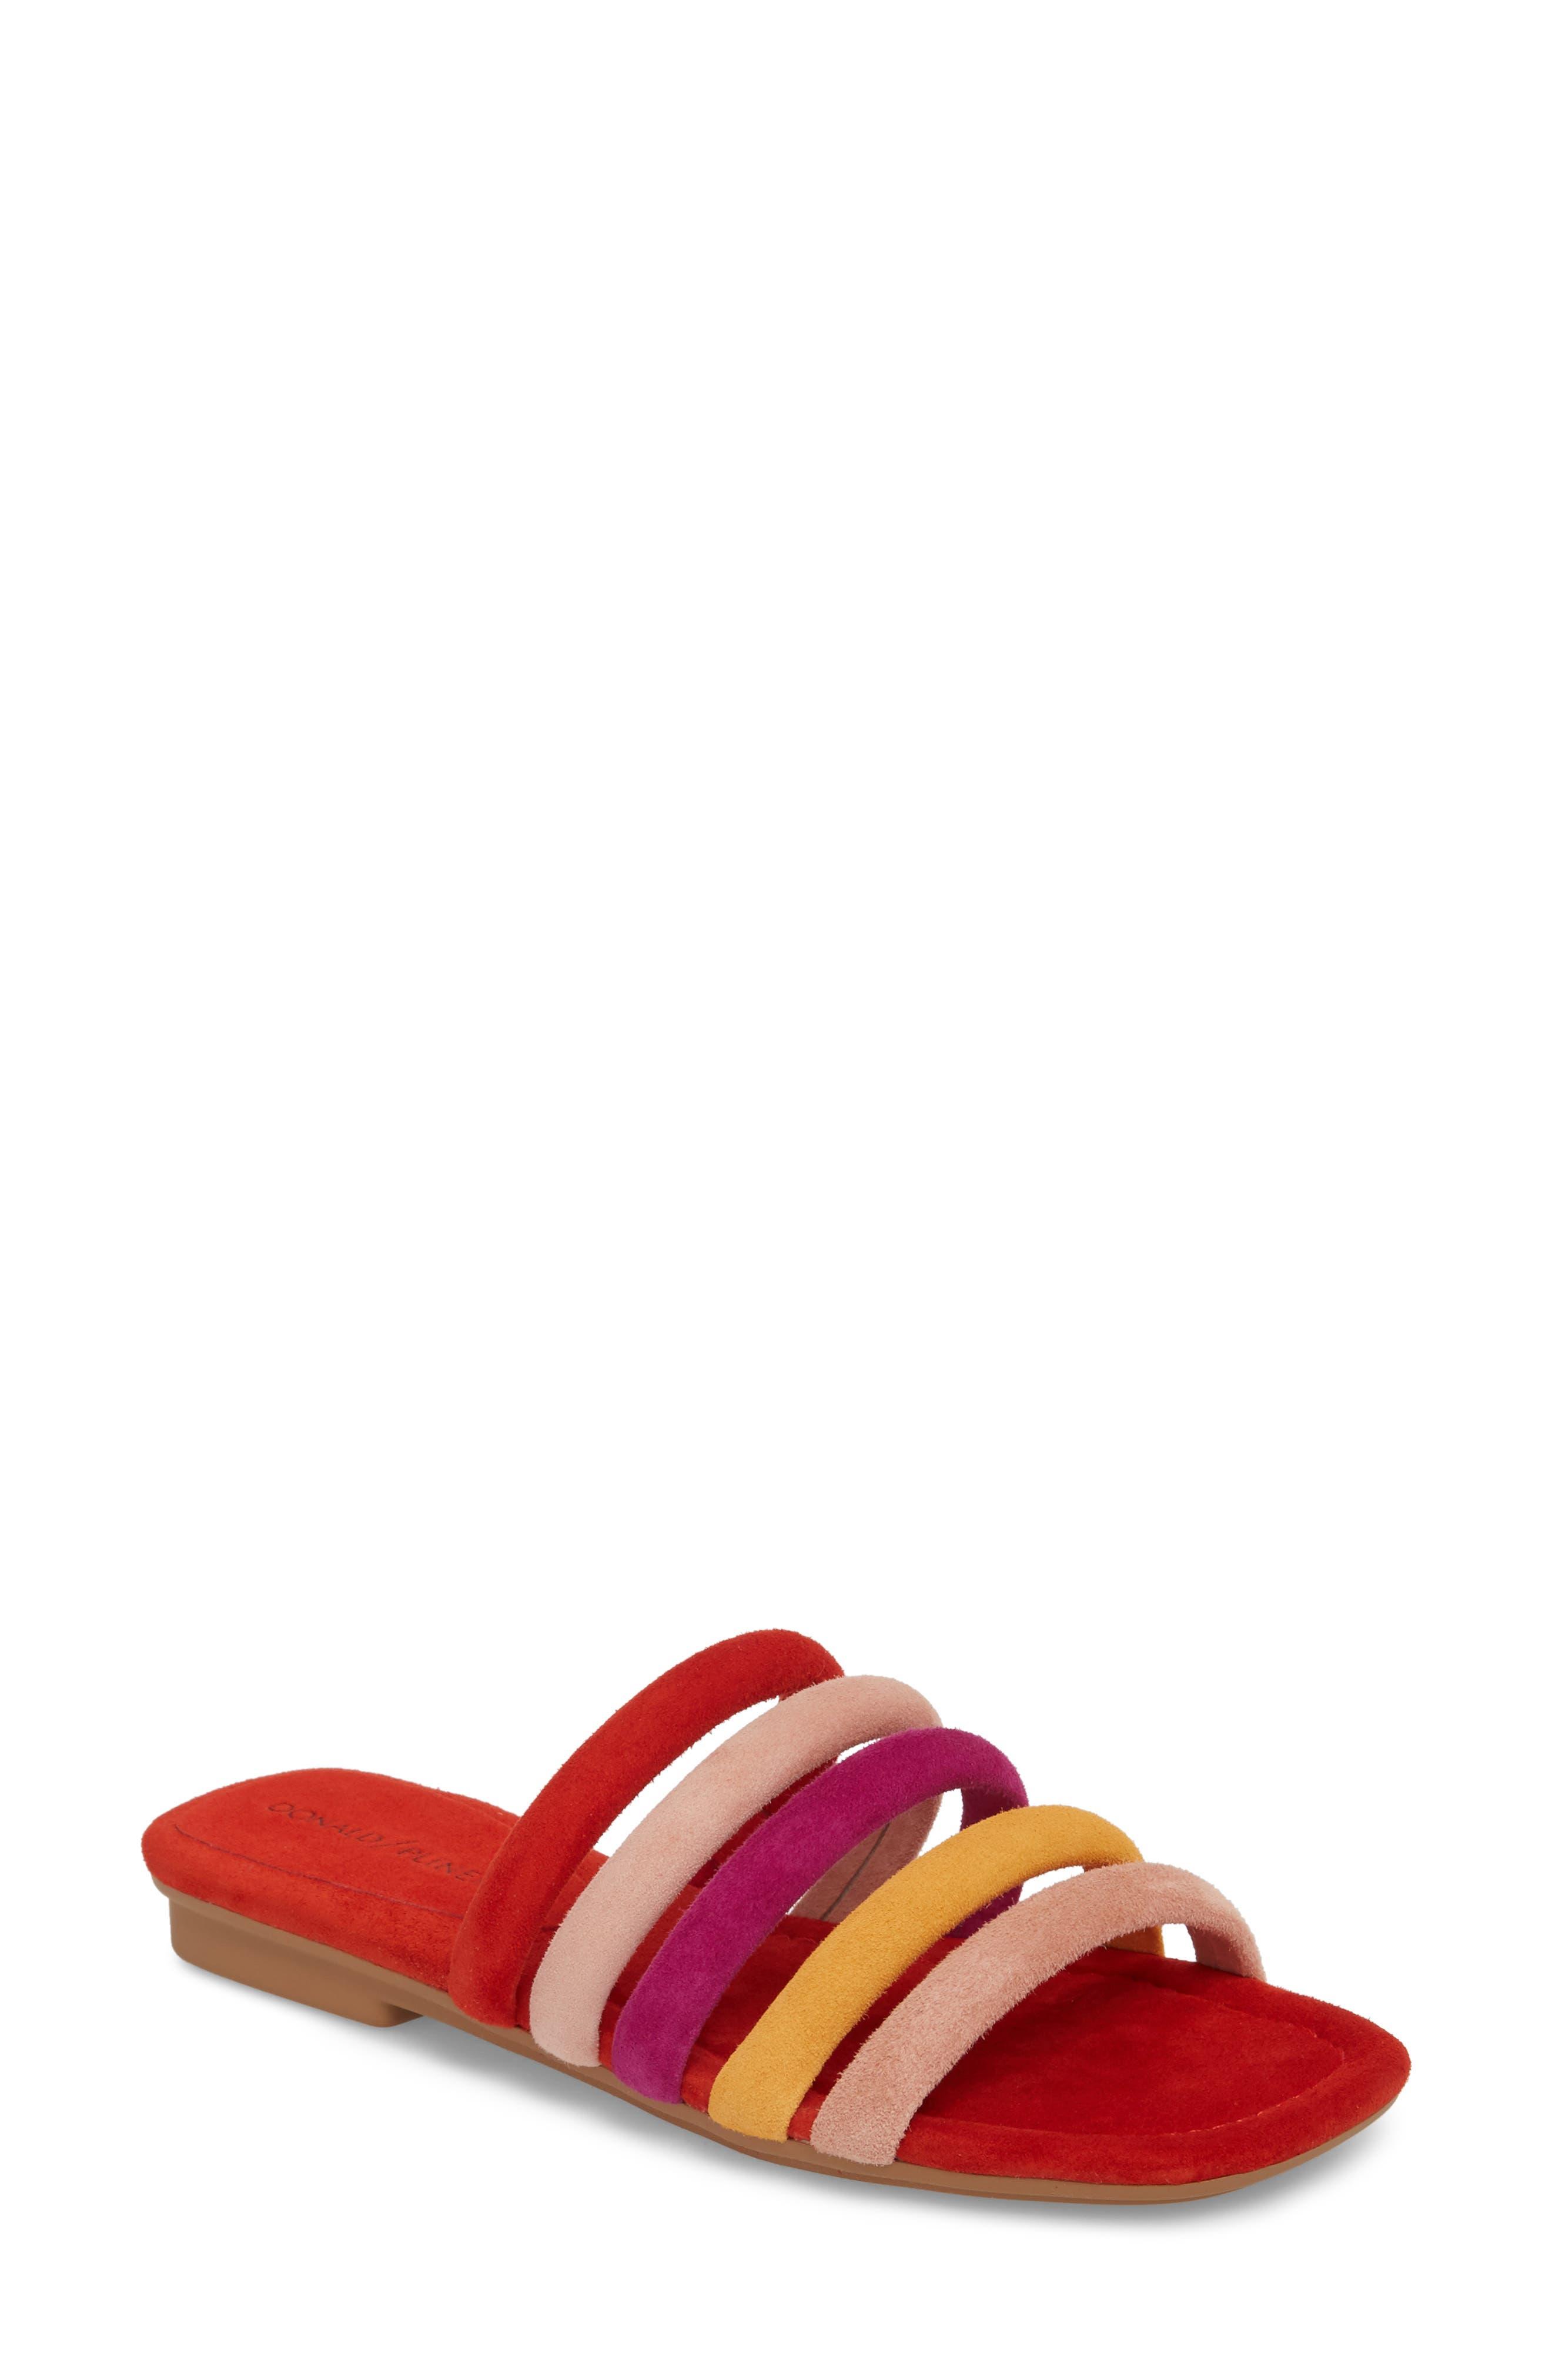 Kip Slide Sandal,                             Main thumbnail 2, color,